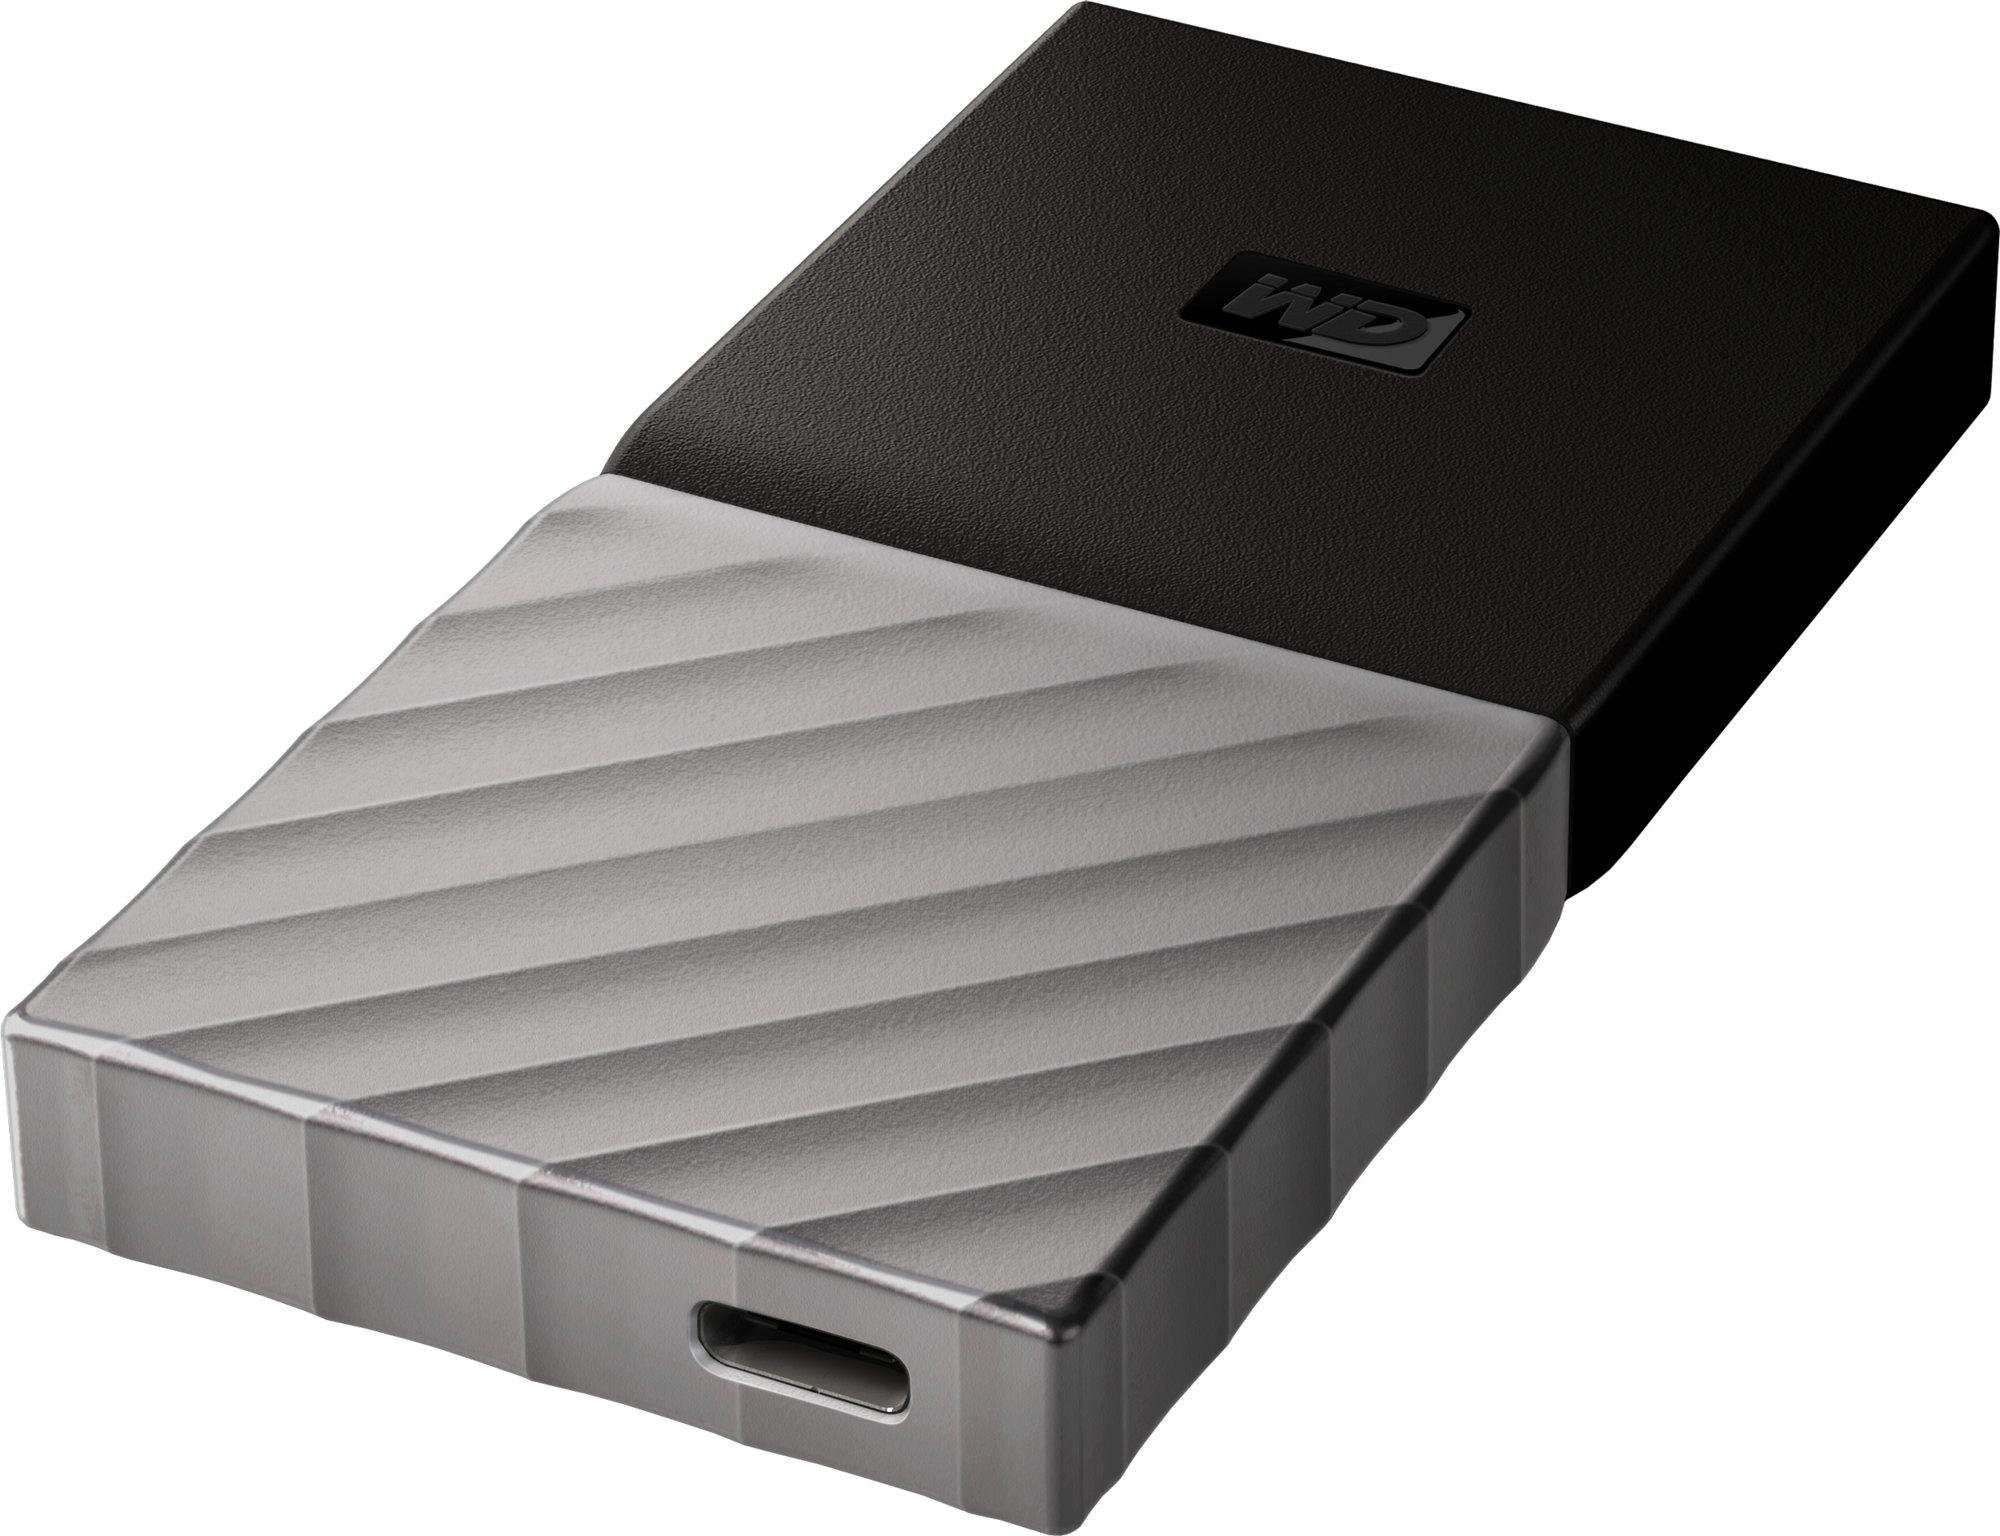 WD My Passport SSD 256GB Ext. USB3.1 Type C , Silver/Black